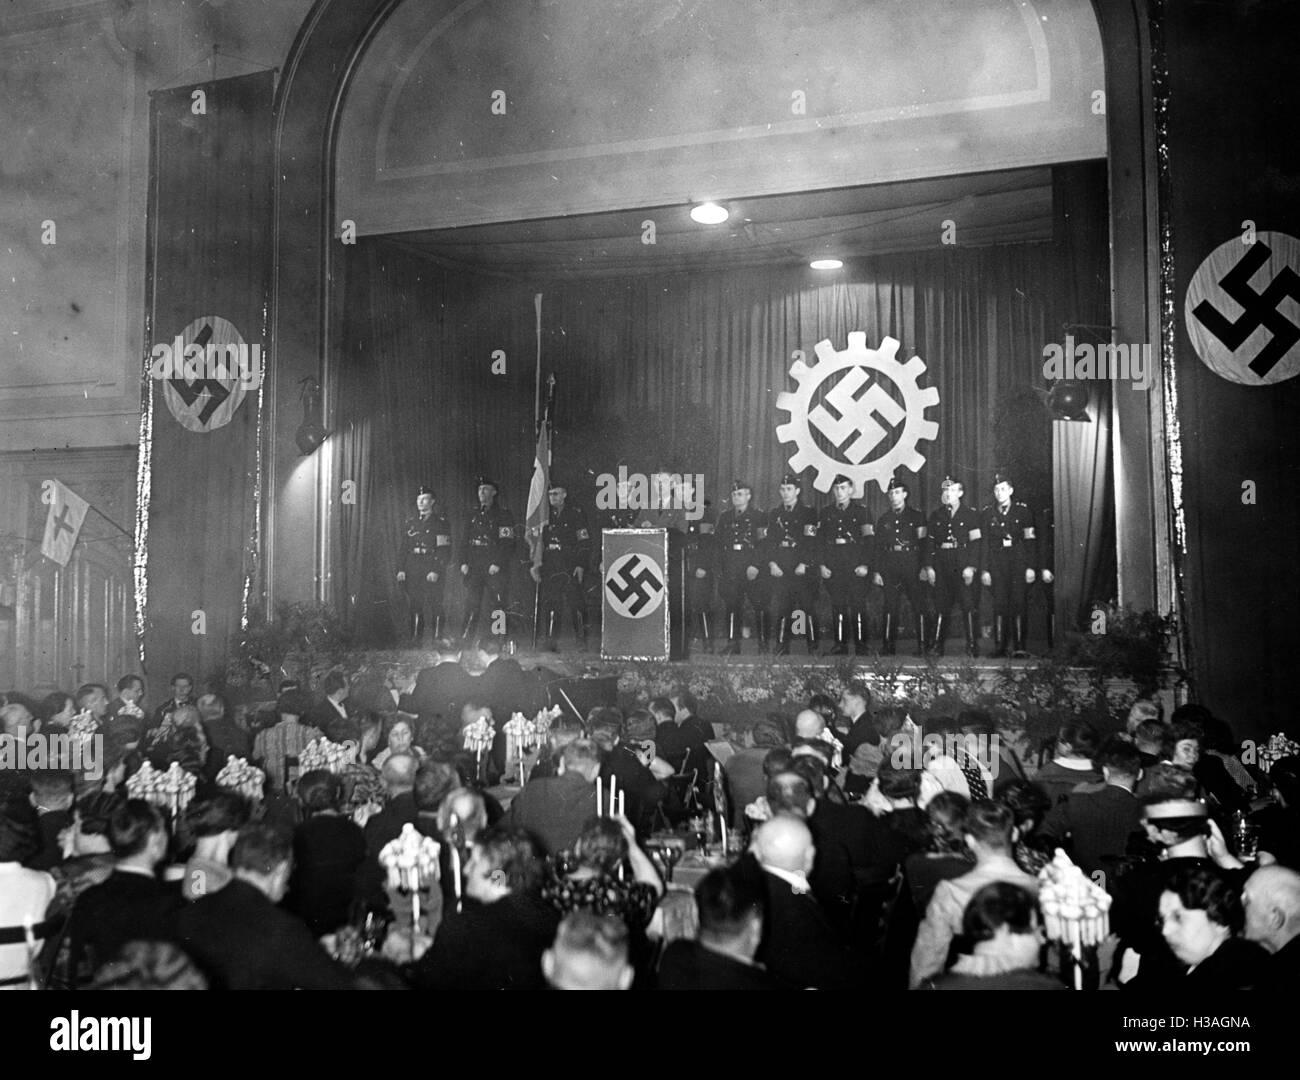 Scherl-event for dealers in Berlin, 1939 - Stock Image